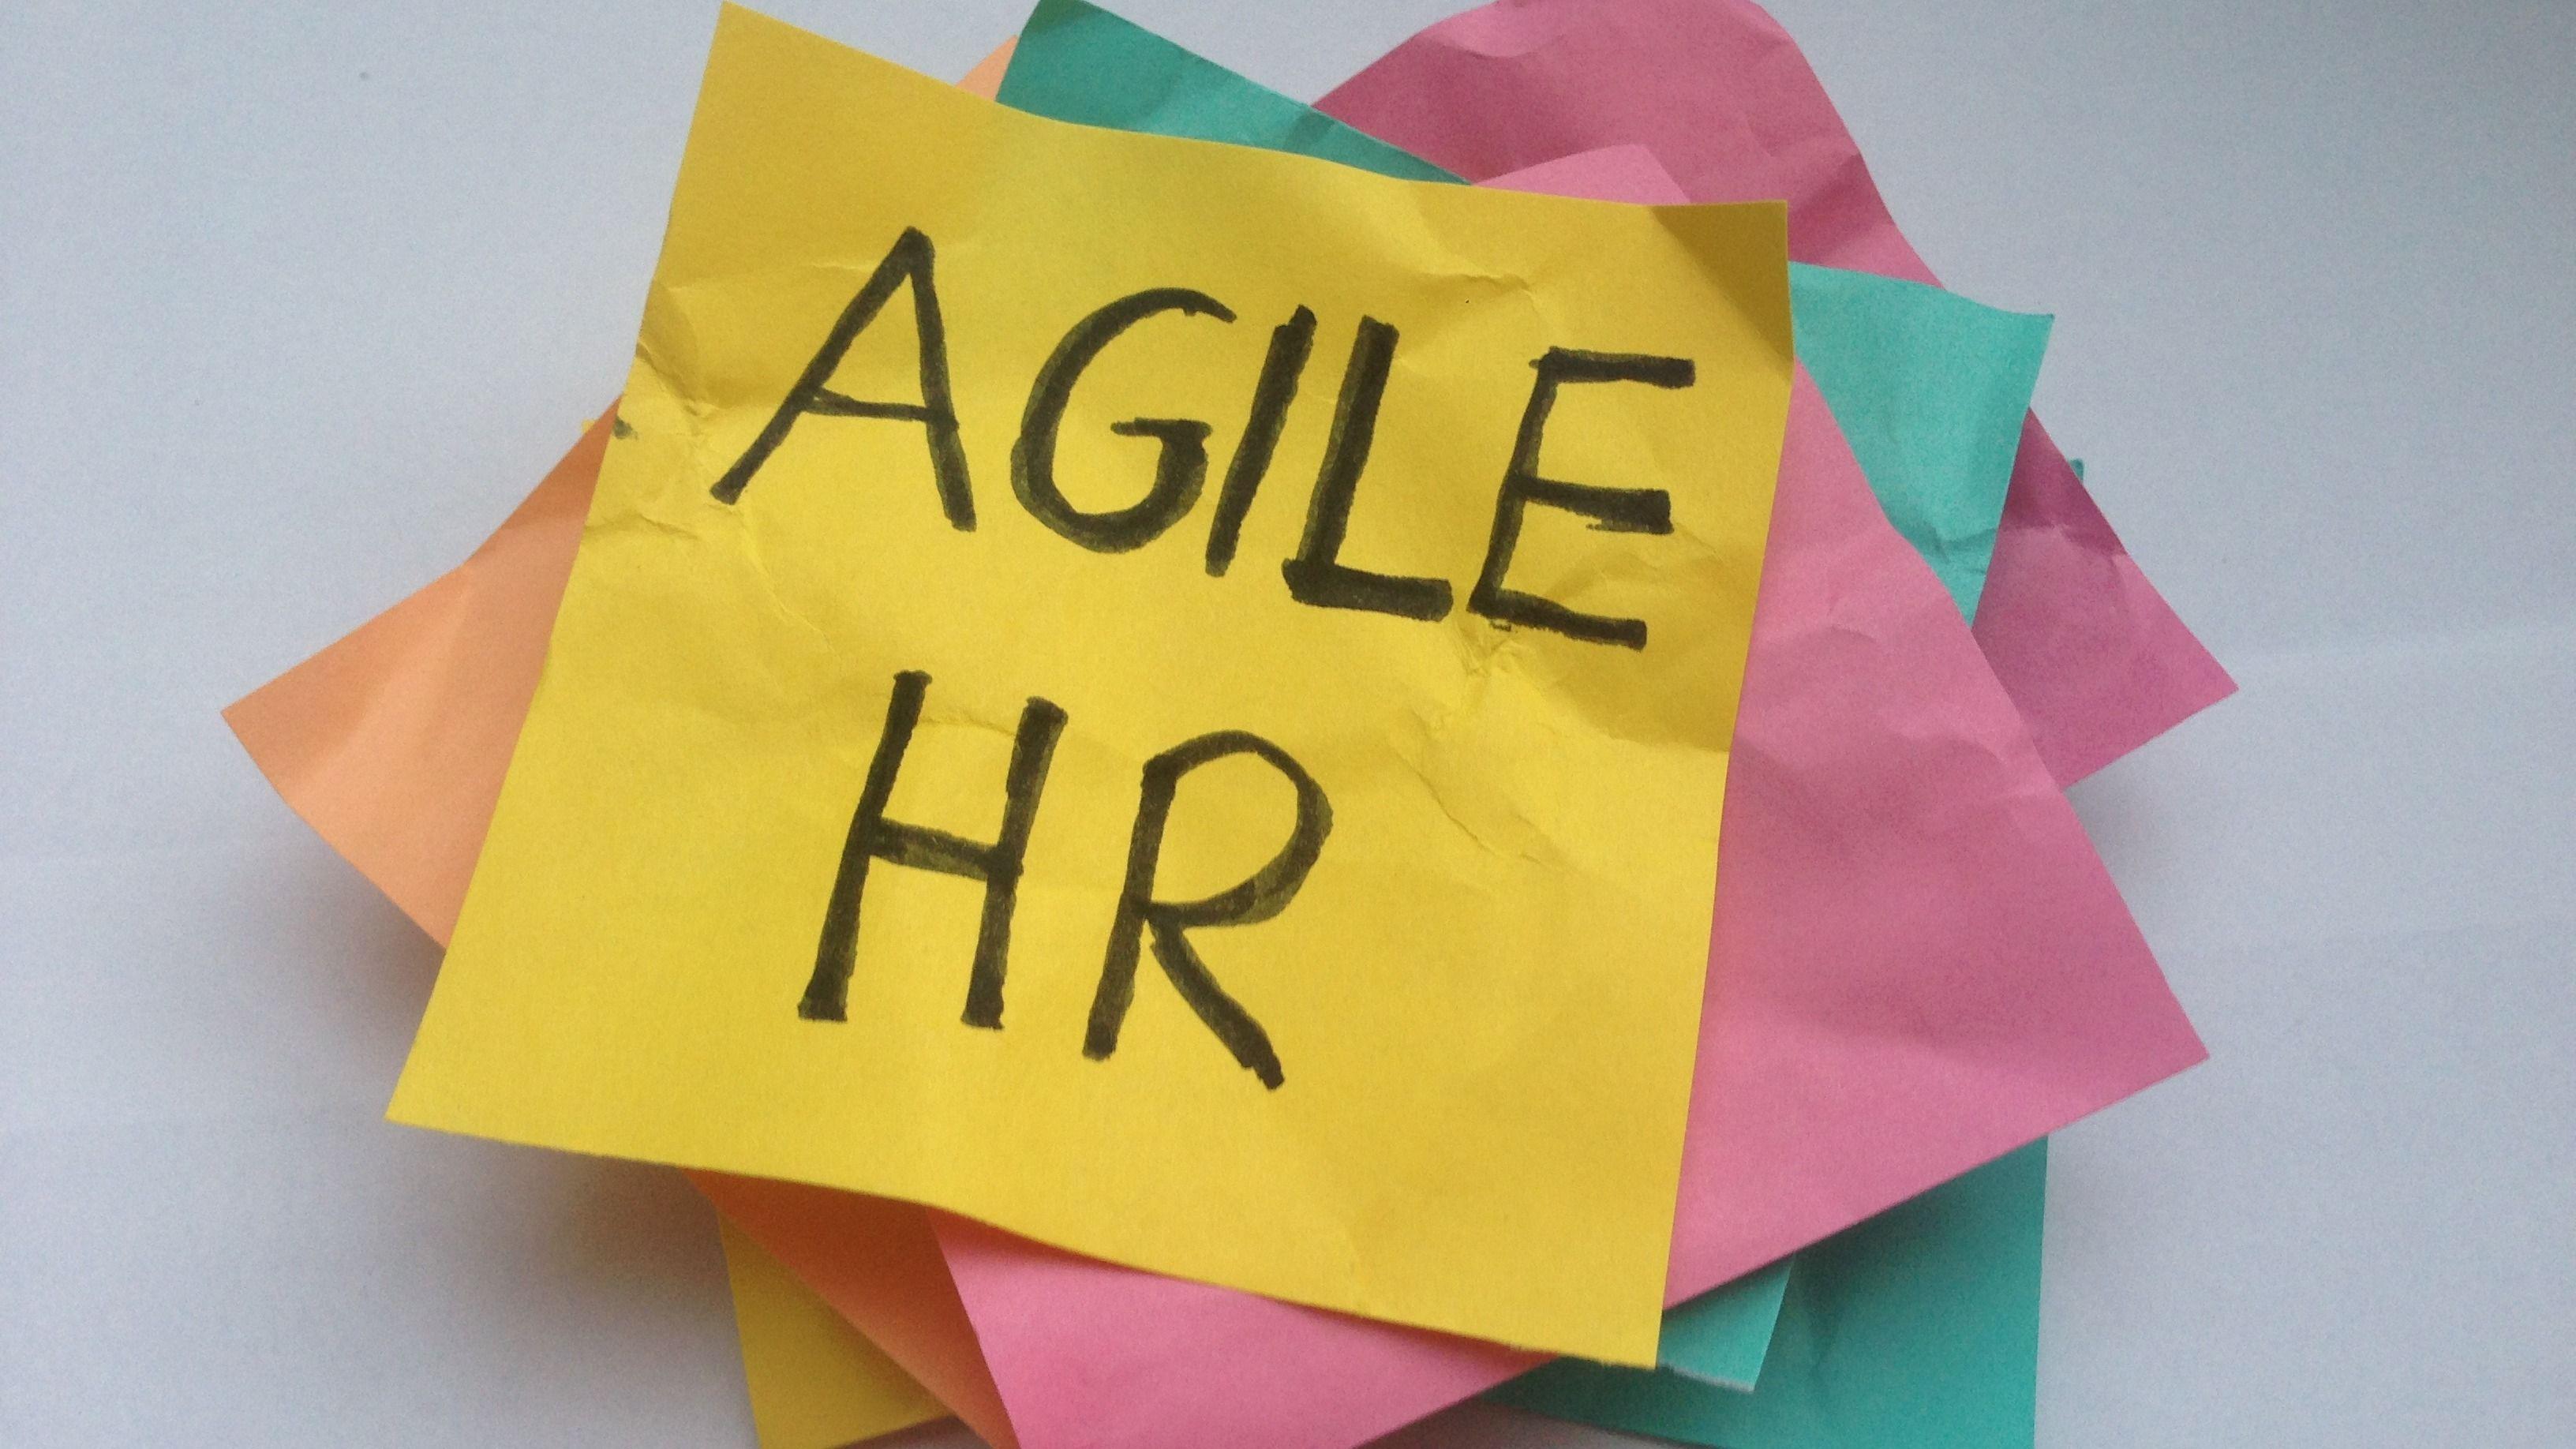 Agile Spiele spieleabend #2 - agile spiele | meetup